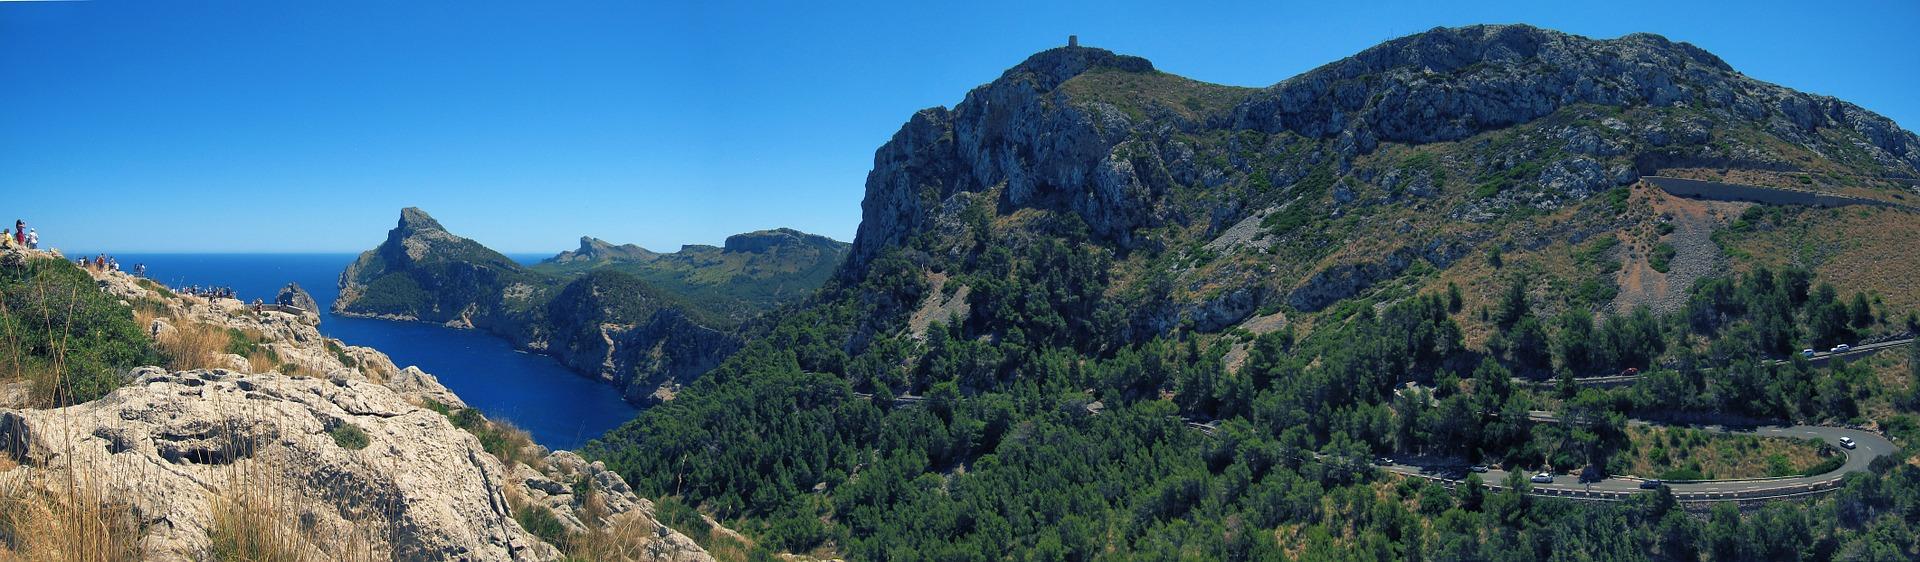 Mallorca Urlaub günstig buchen | 5 Nächte ab 140,00€ Flug & Hotel